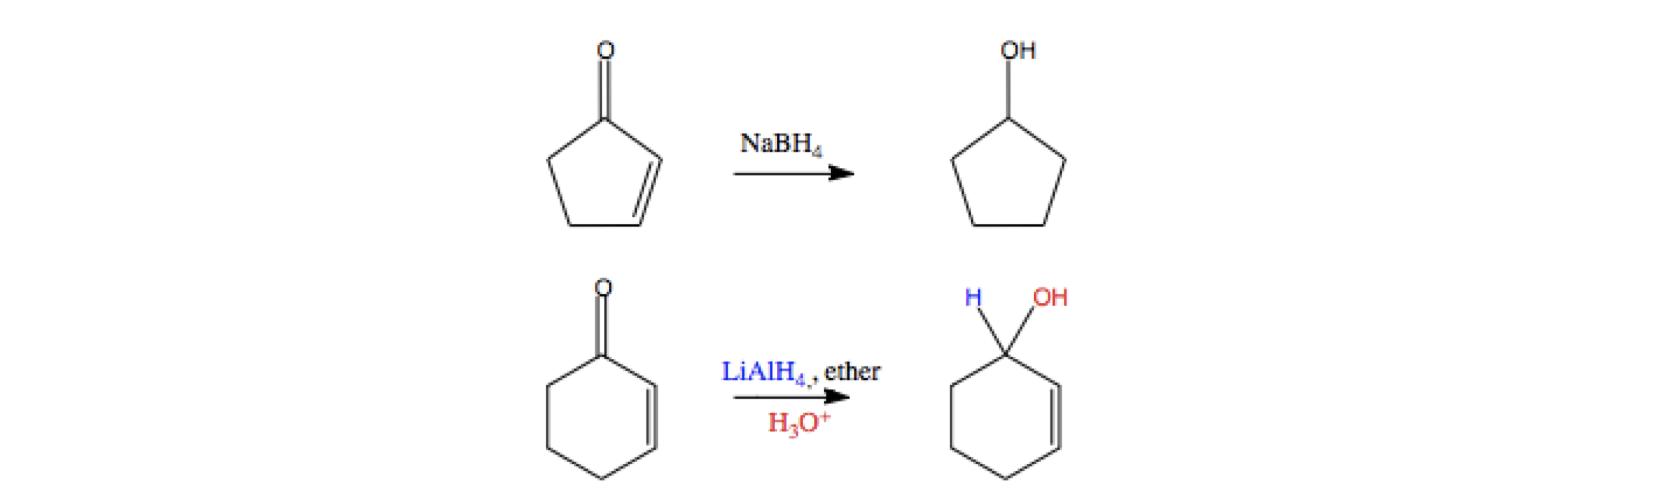 NaBH4-vs-LiAlH4